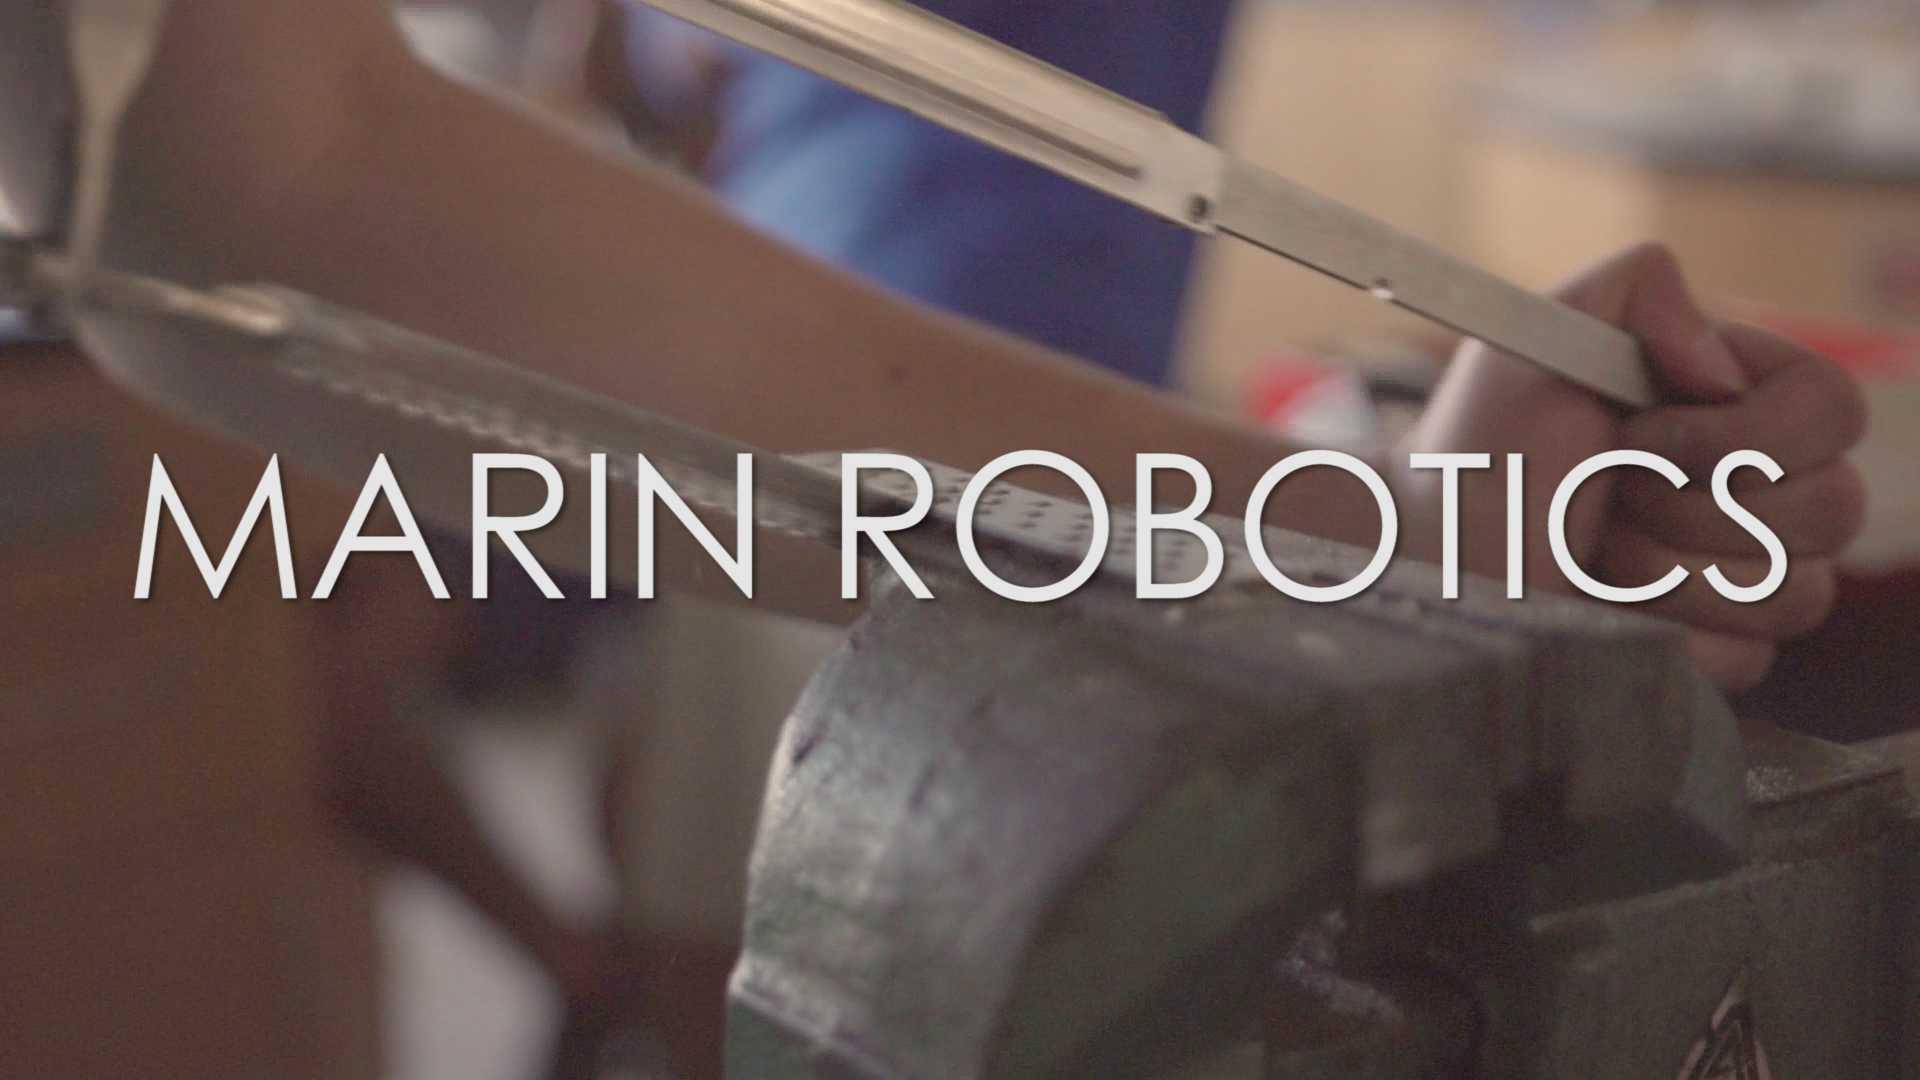 Marin Robotics looks to improve upon last year's success